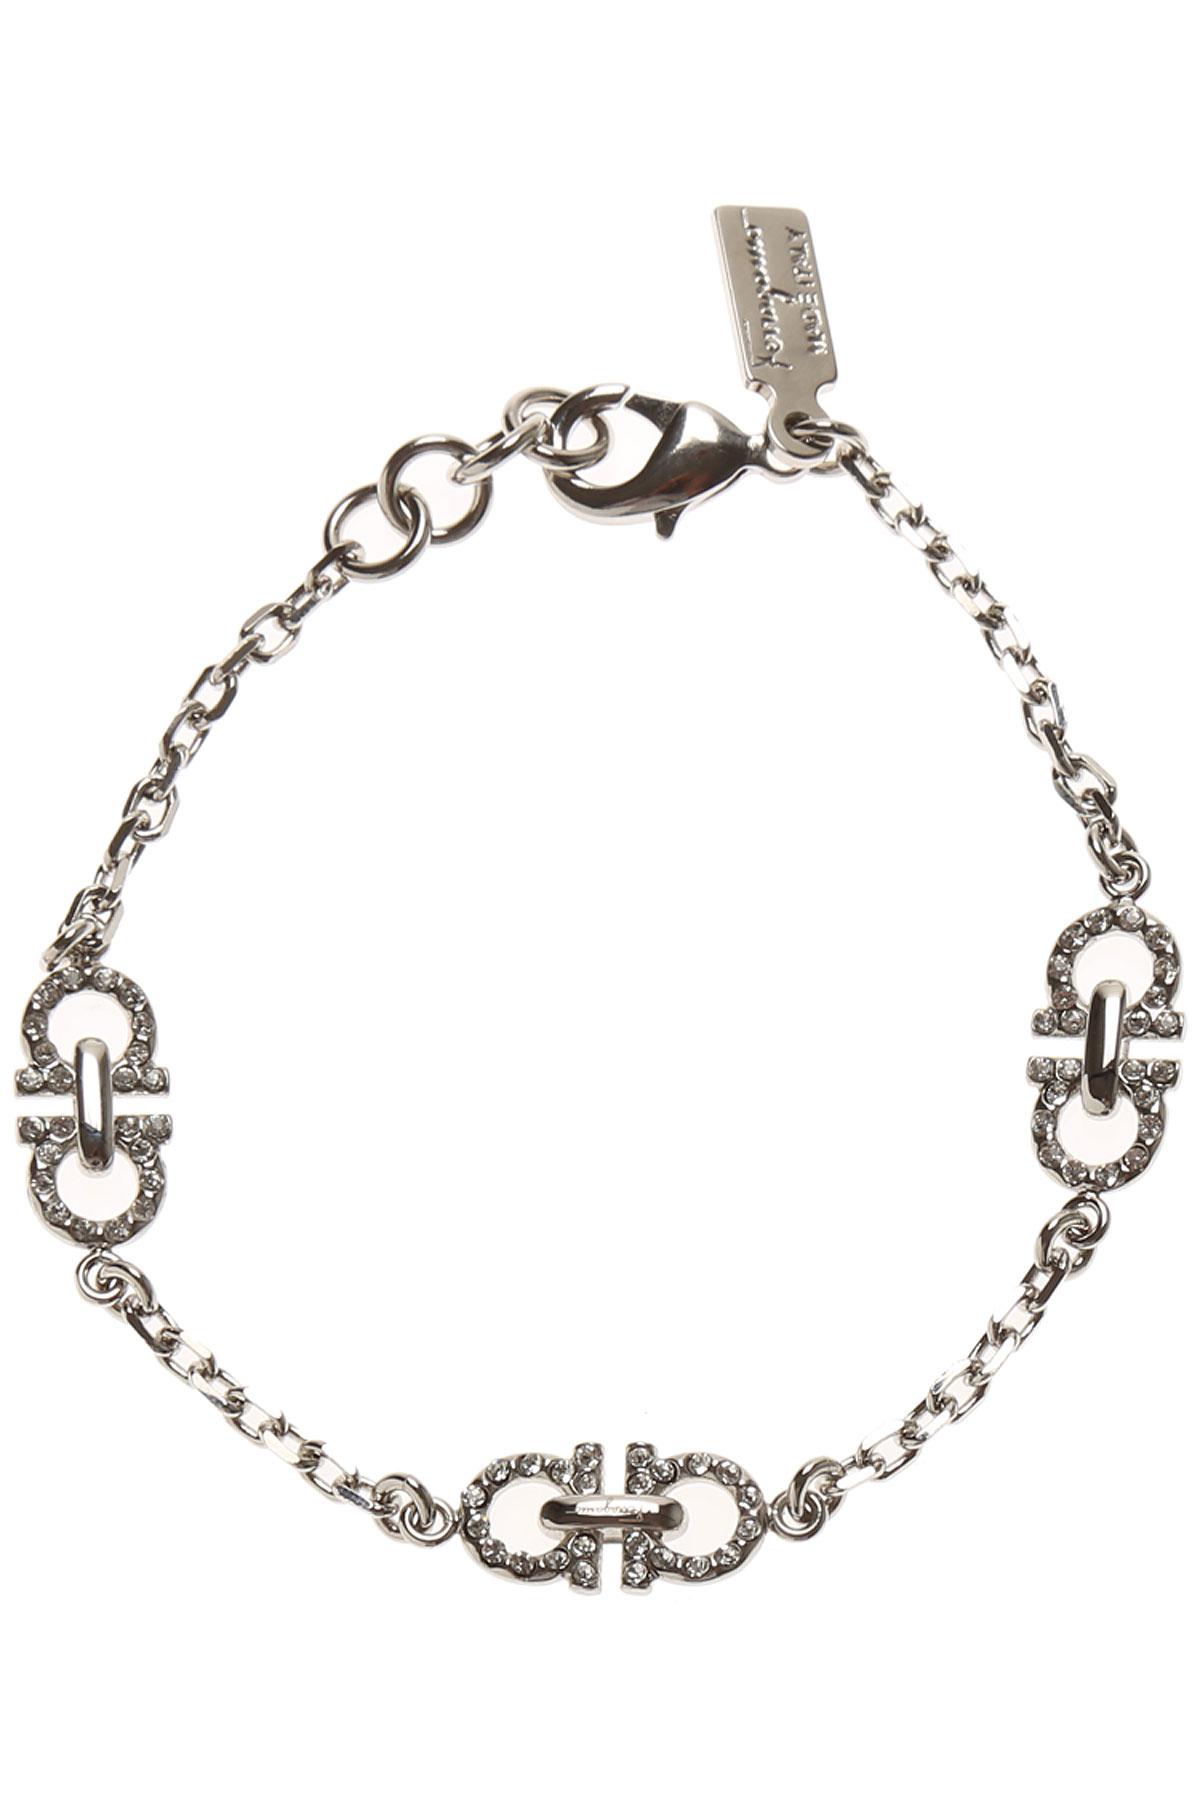 Image of Salvatore Ferragamo Bracelet for Women, Silver, Brass, 2017